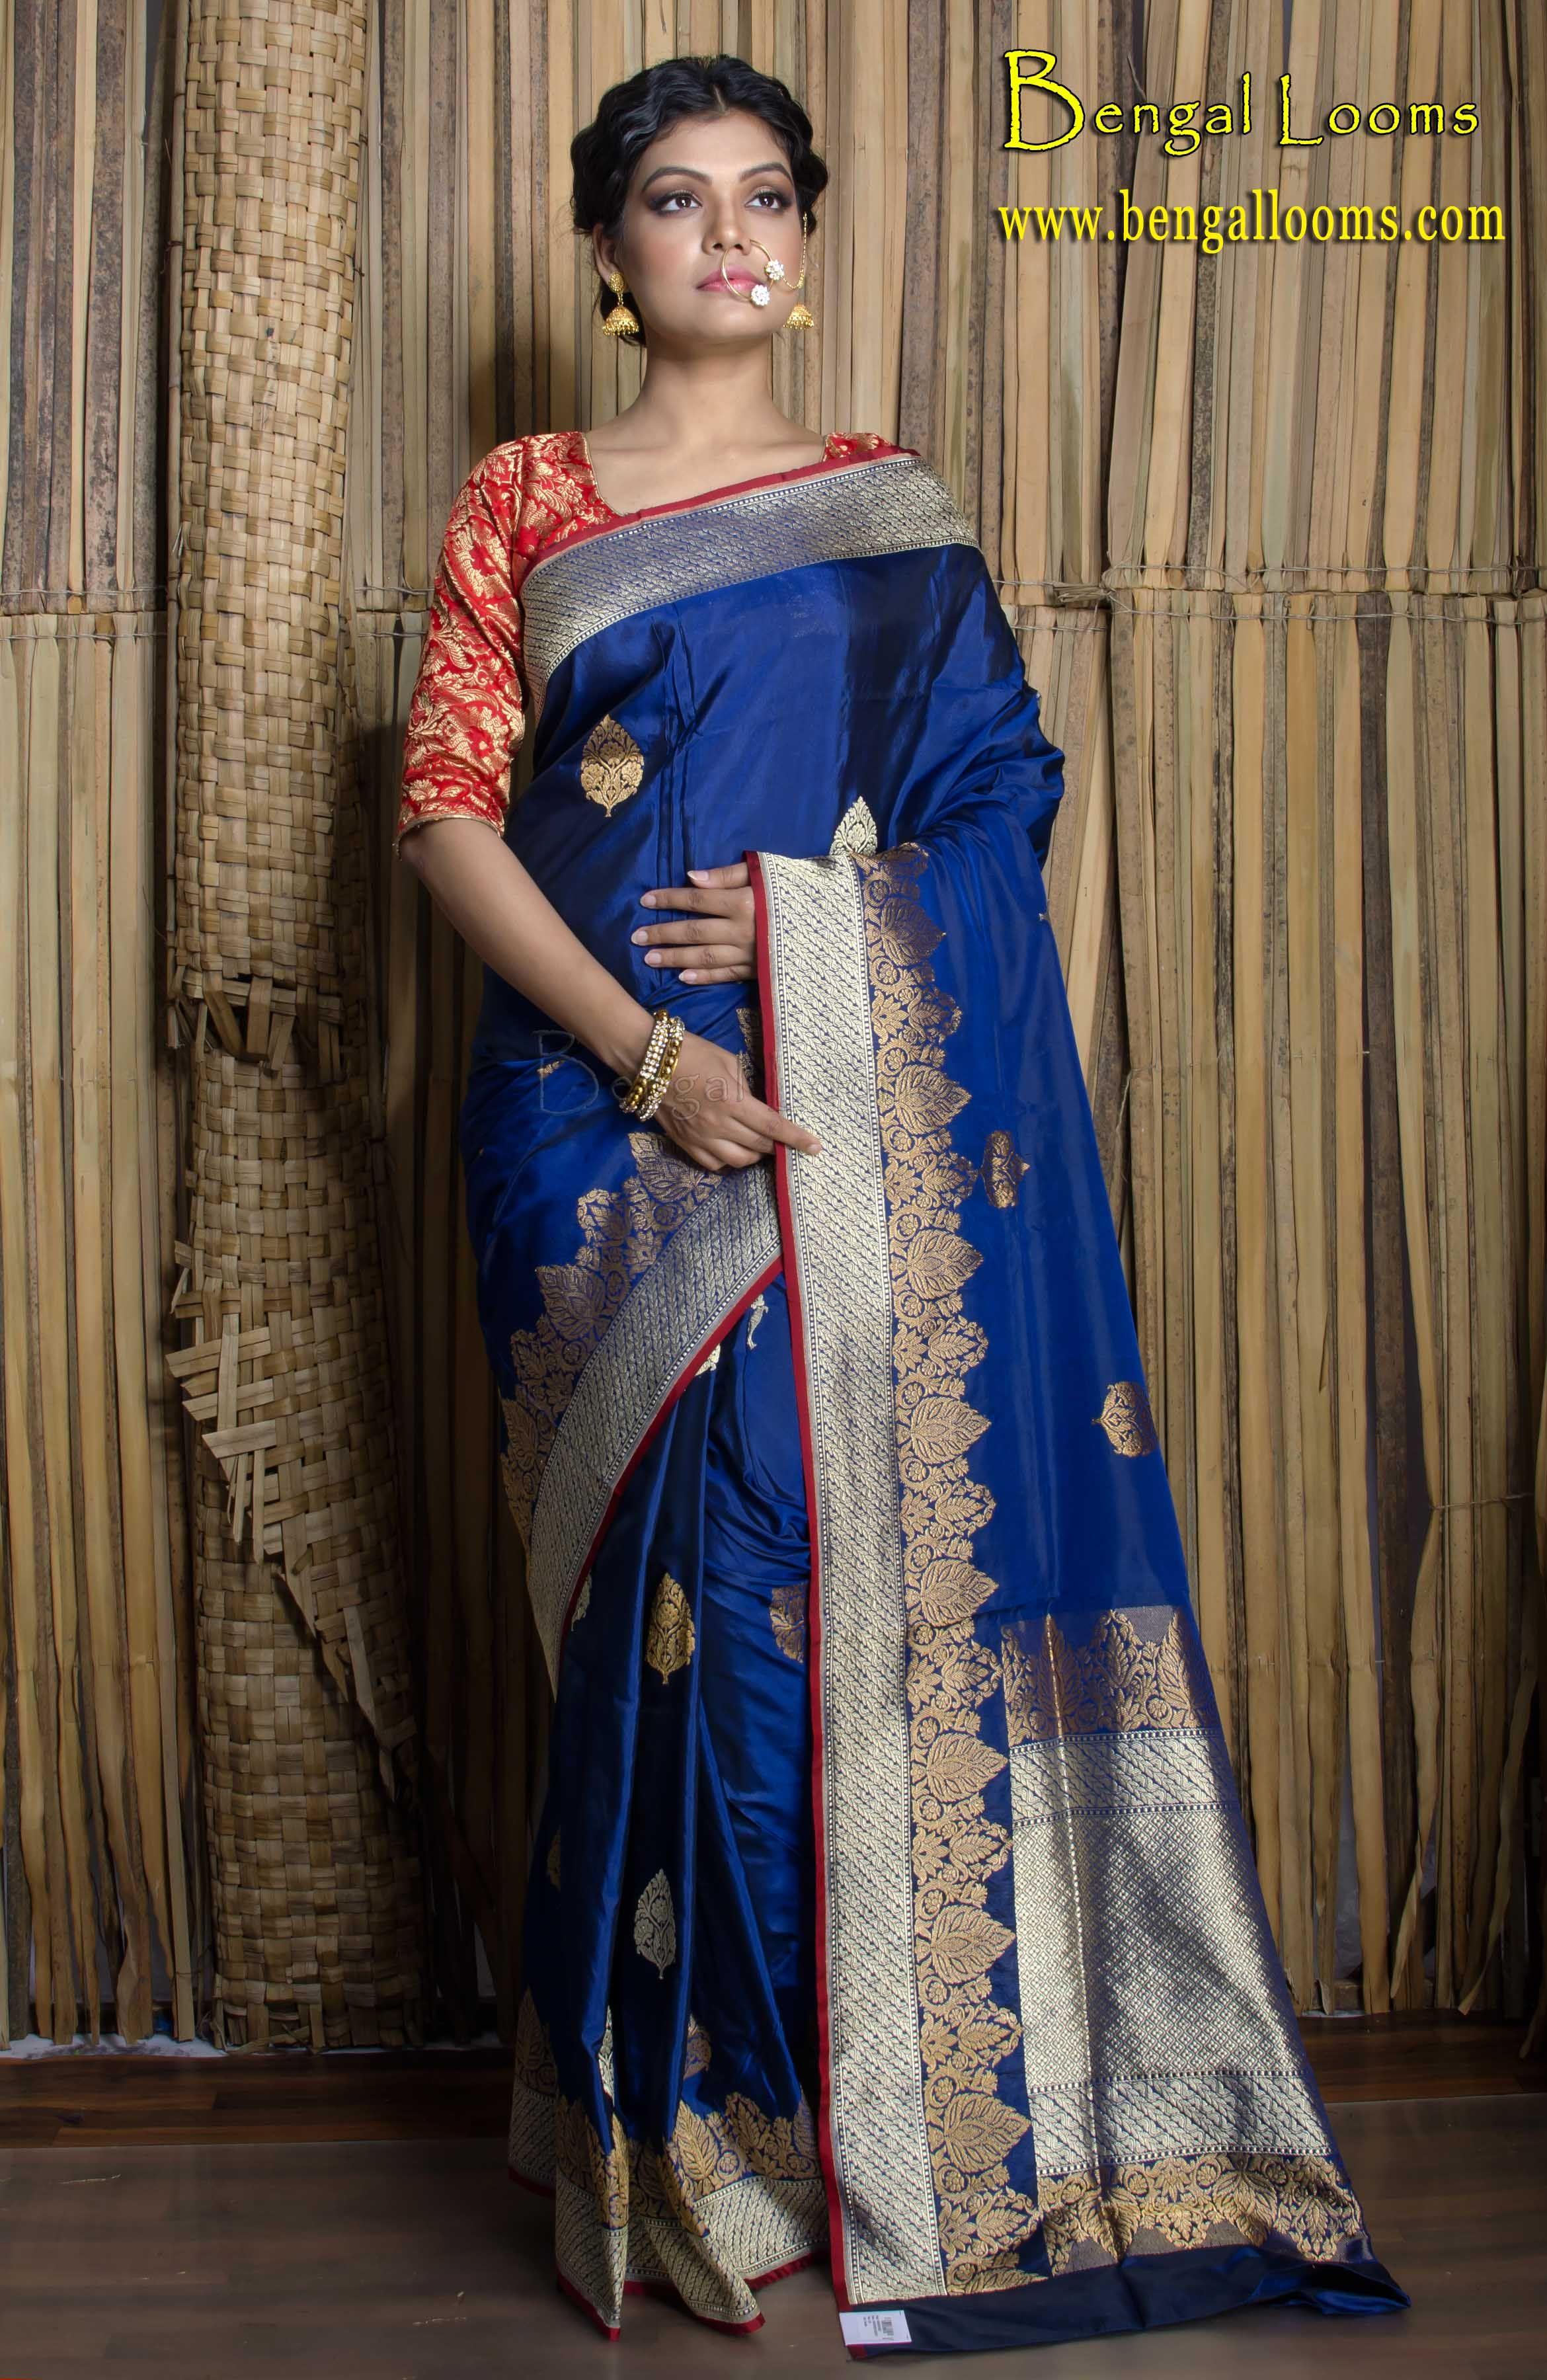 5019b8e812f9b Pure Katan Silk Banarasi Saree with Silver and Gold Thread in Royal Blue